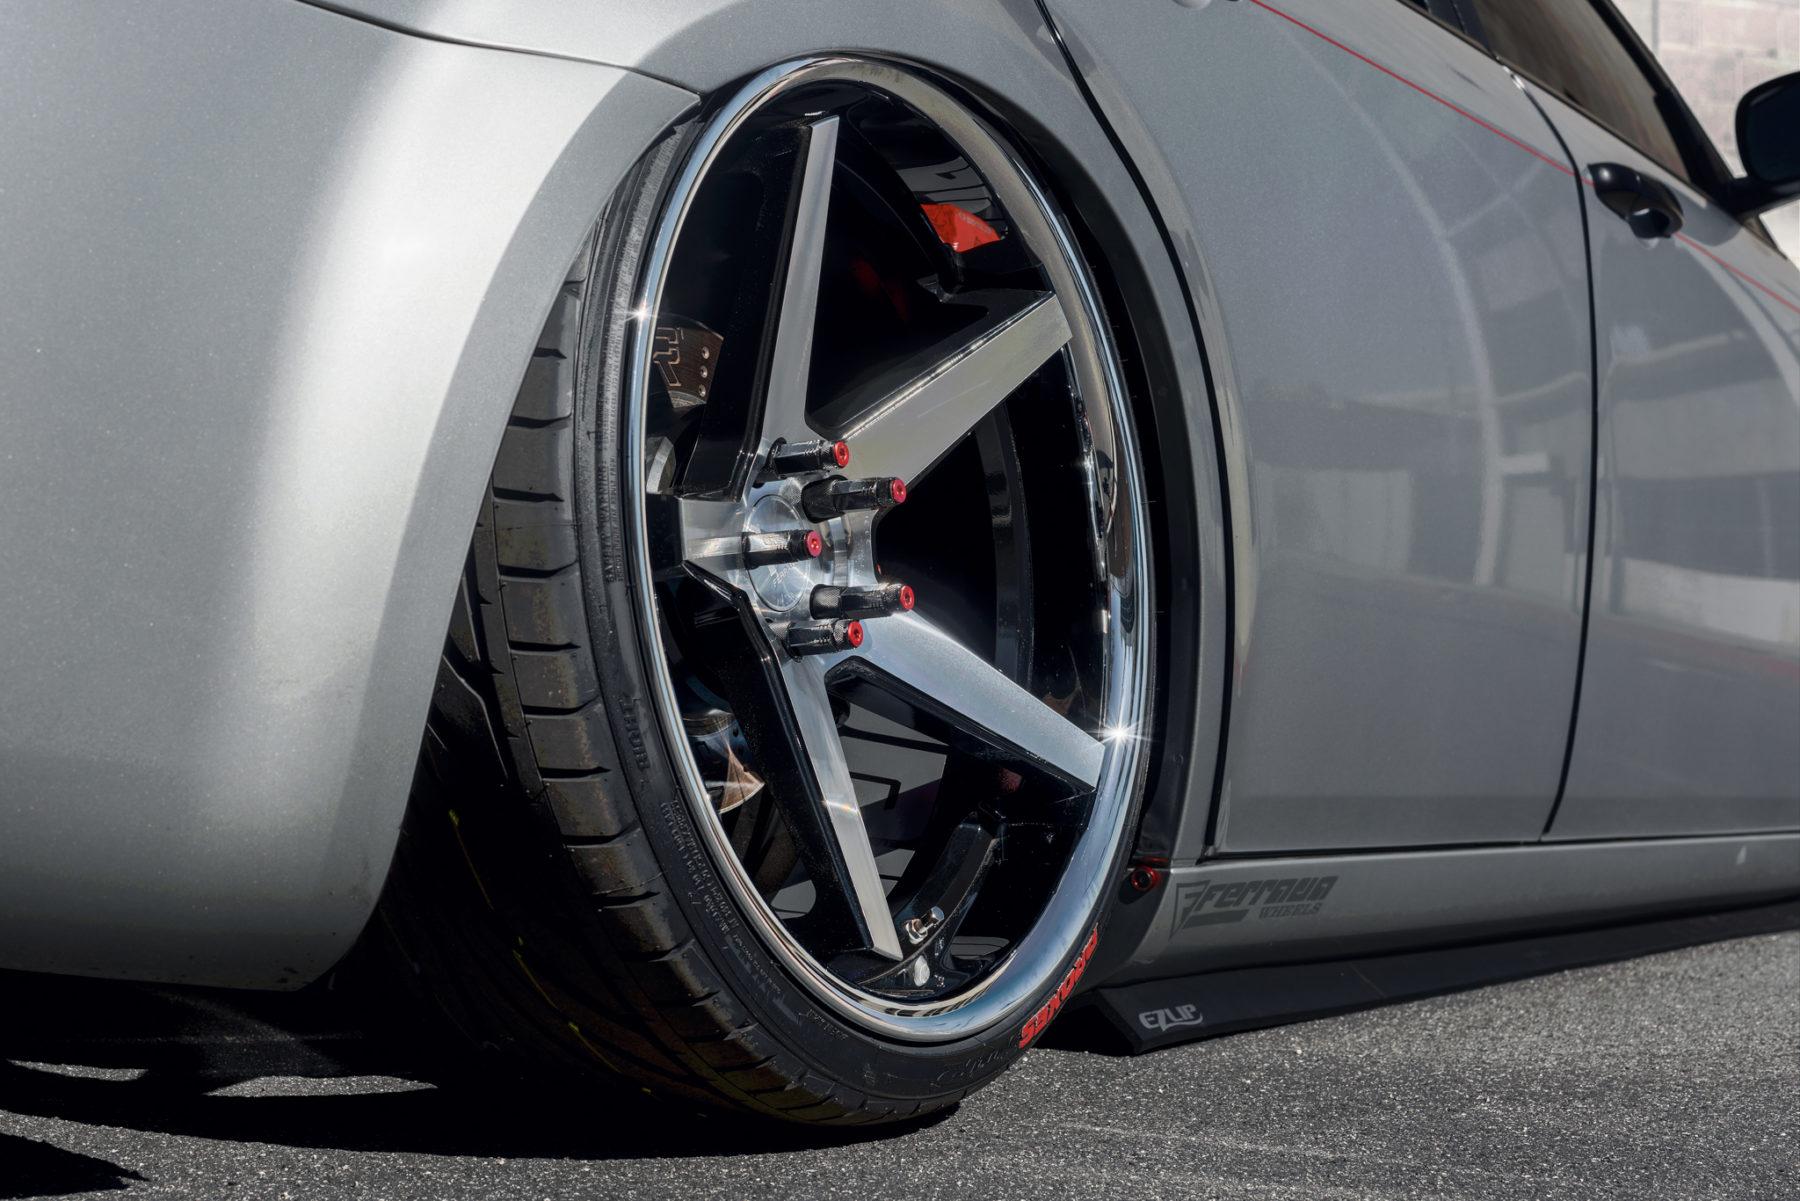 Ferrada Fr3 Dodge Charger Challenger Wheel Set 5x115